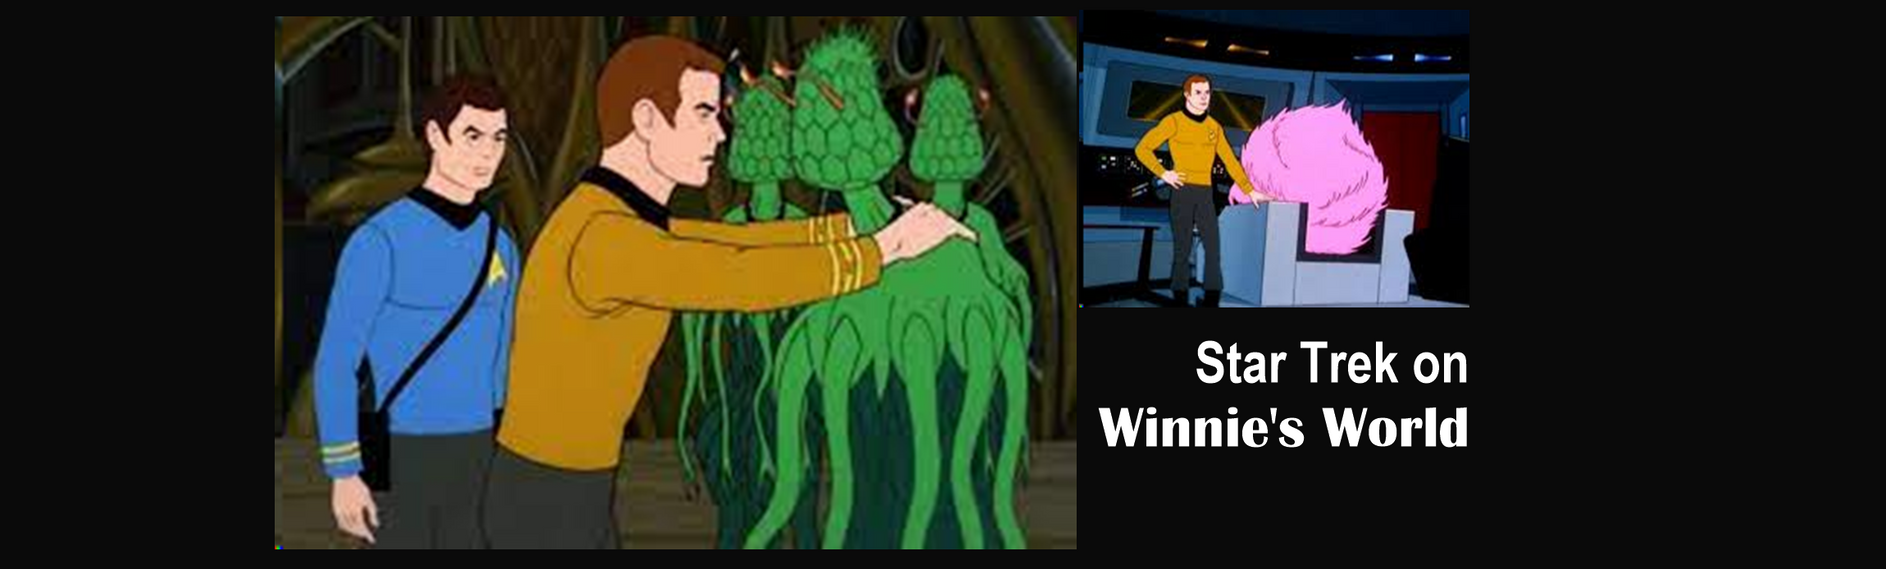 Star Trek on Winnies World no 3.png